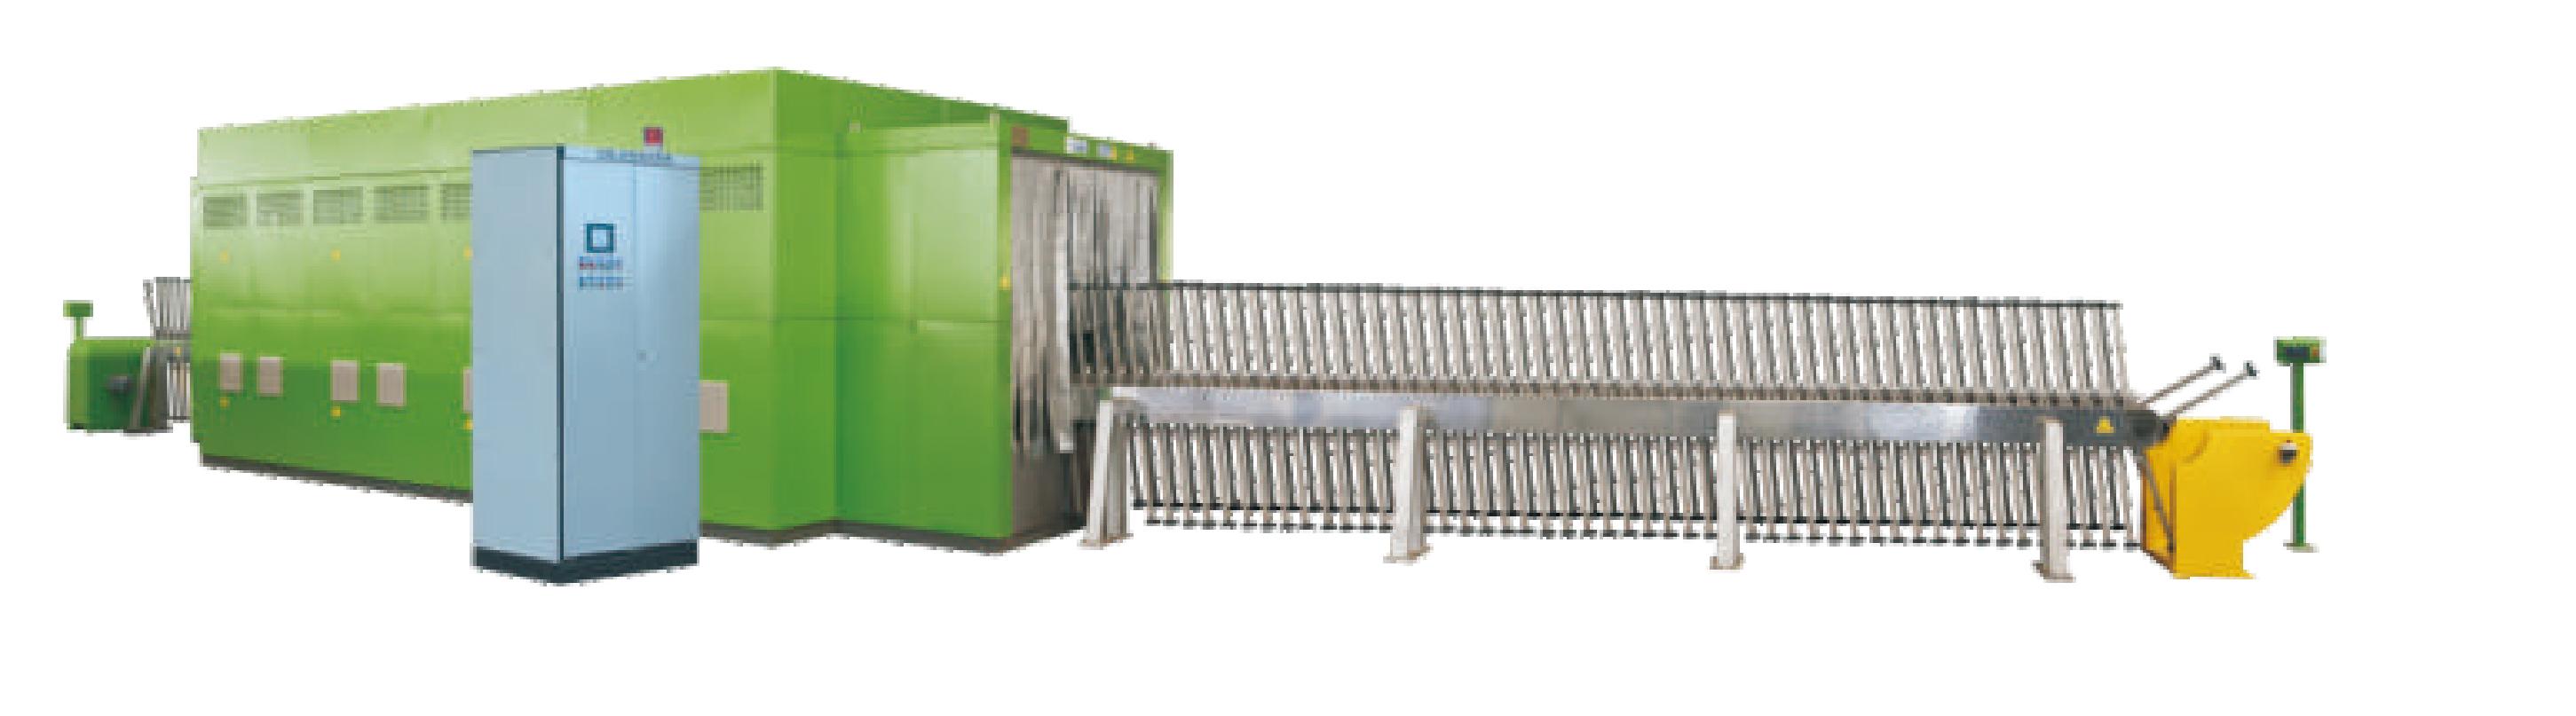 BZ1218B vacuum pre-pressing machine